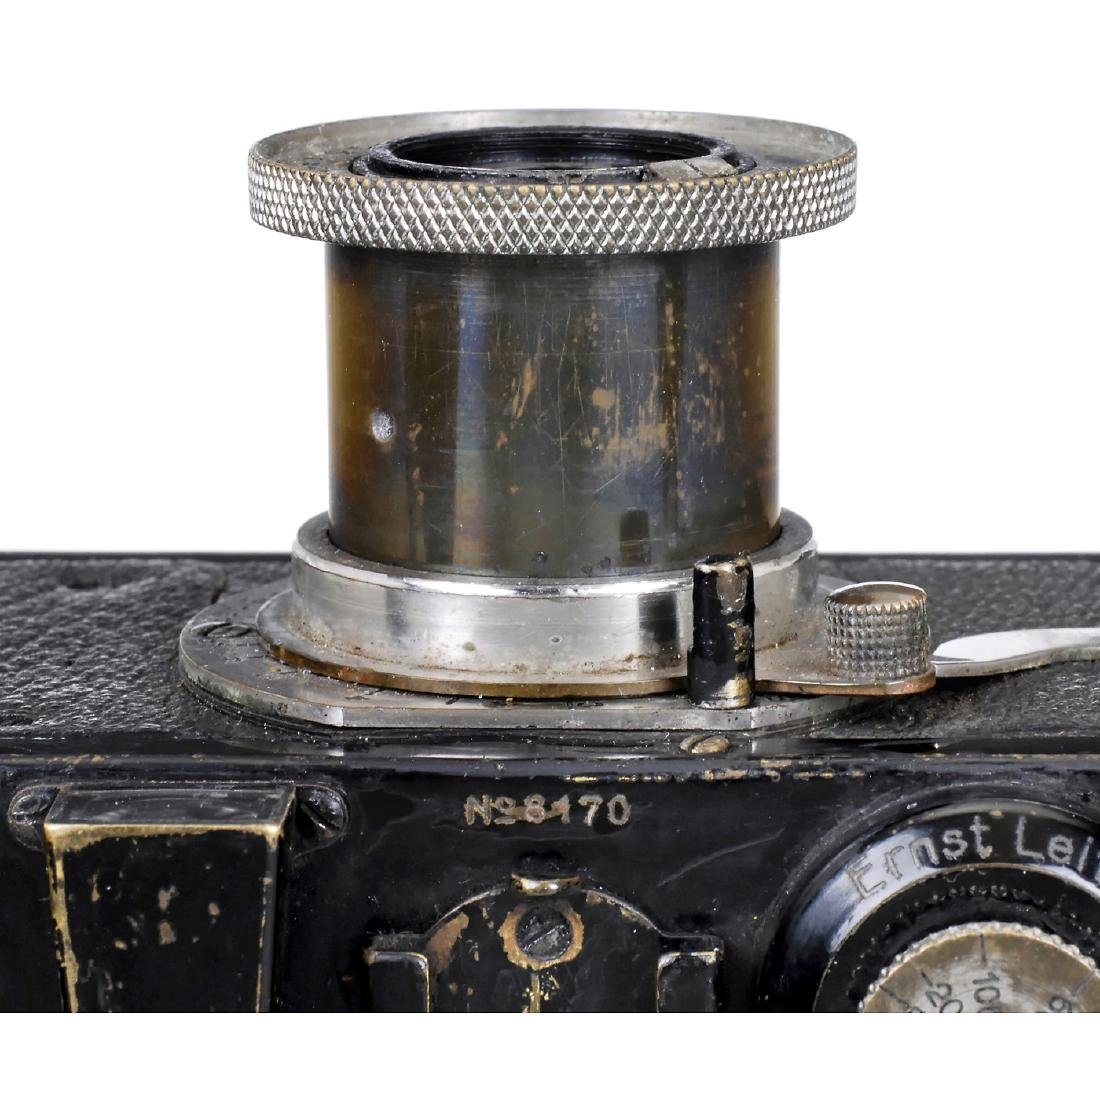 Leica I (A) with Elmar 3,5 (Near-Focus Version), 1928 - 3